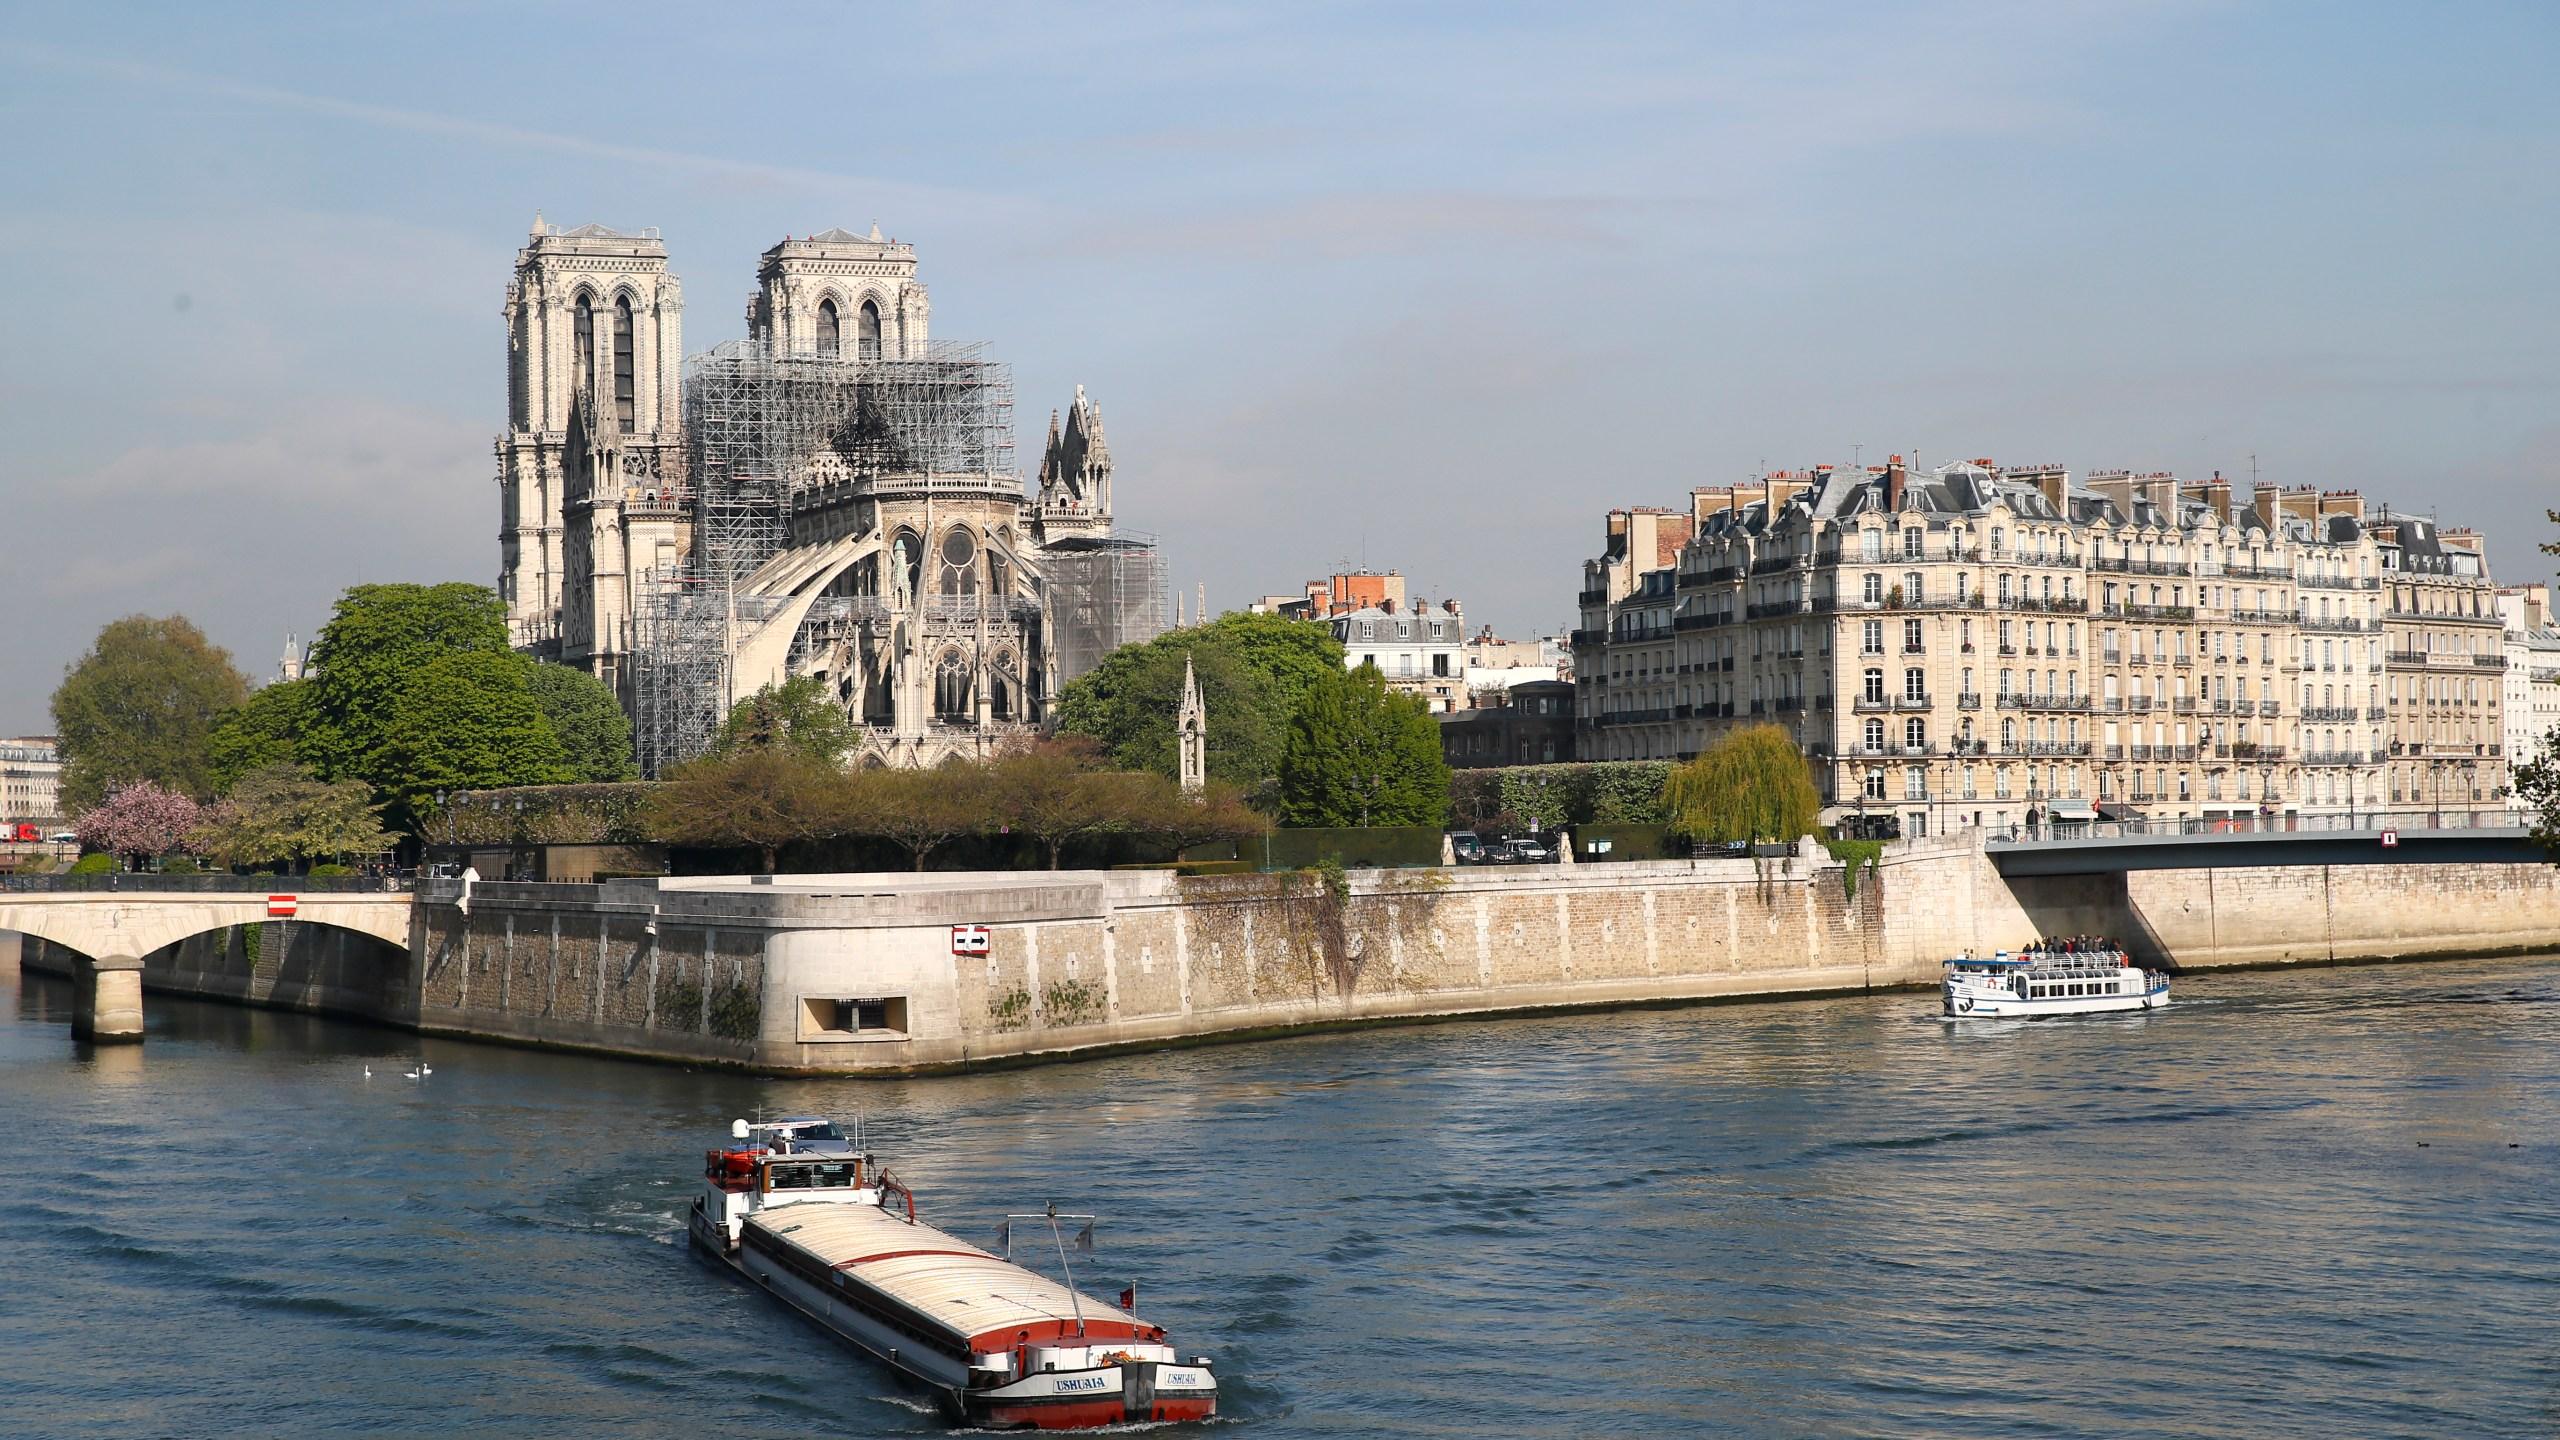 France_Notre_Dame_Fire_41905-159532.jpg73712831